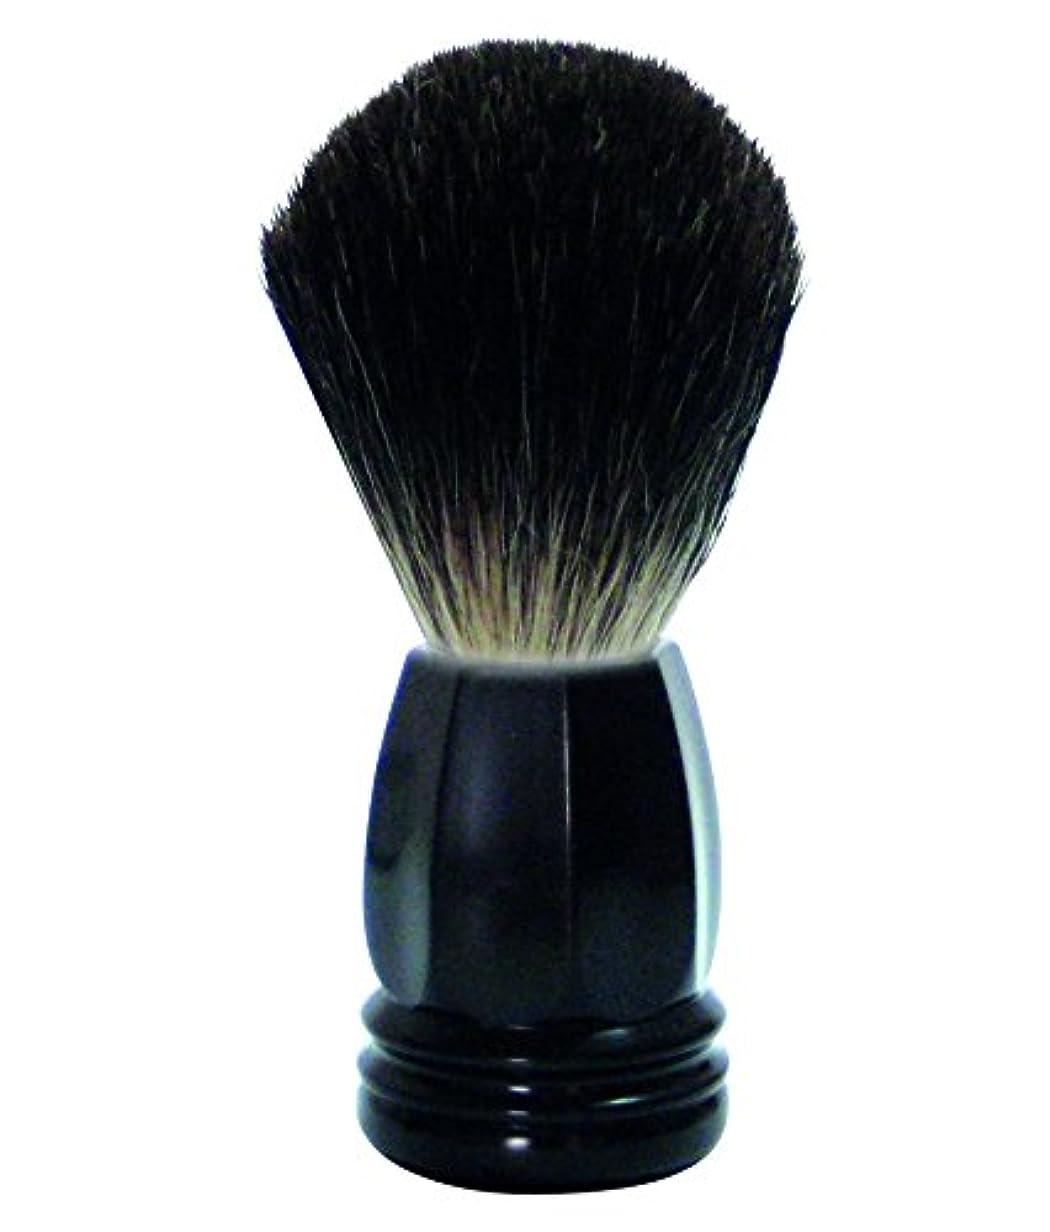 GOLDDACHS Shaving Brush, 100% Badger hair, black polymer handle